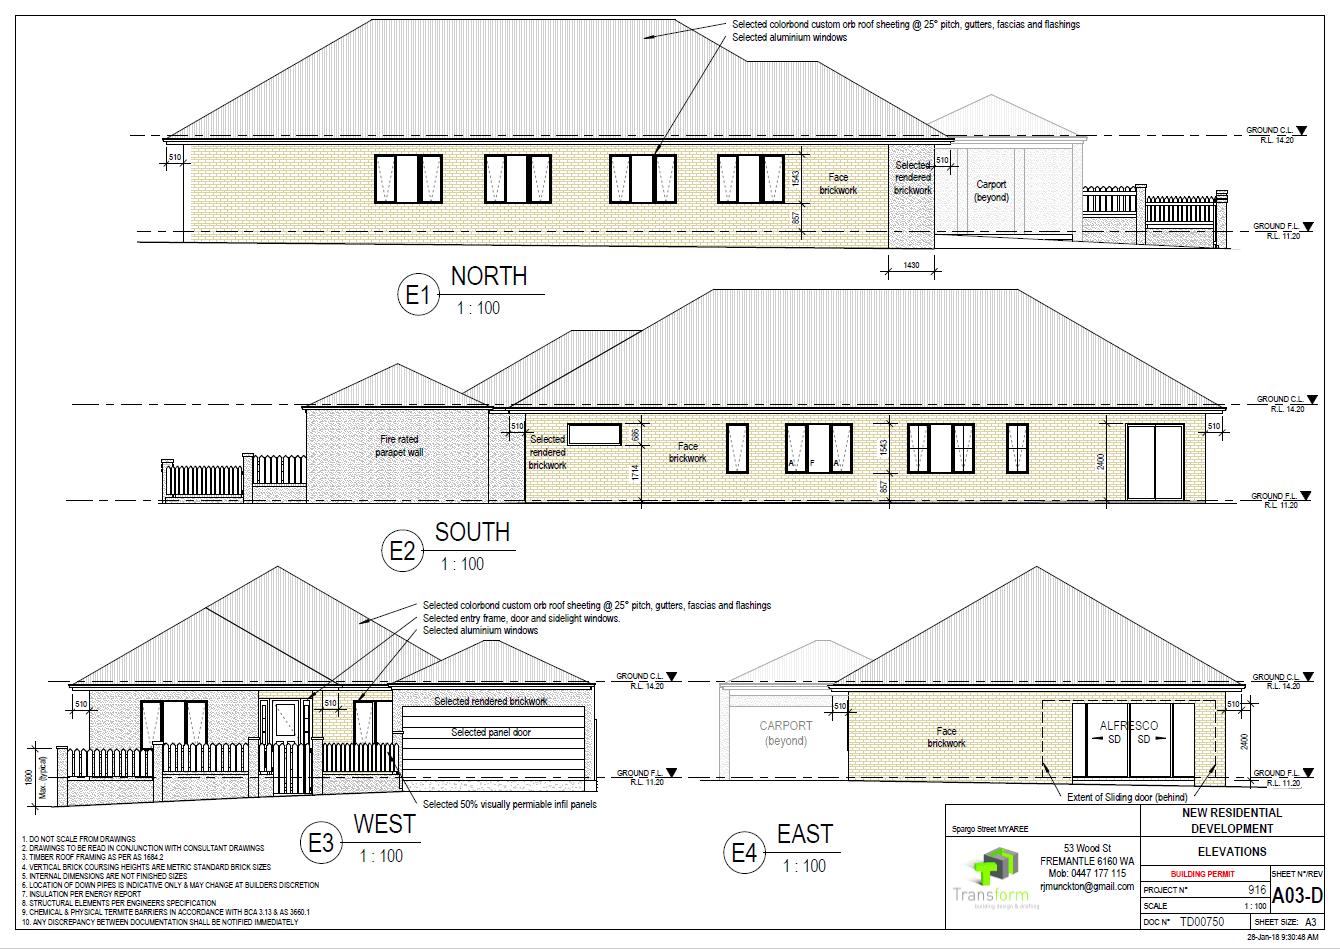 4. Elevations (4)